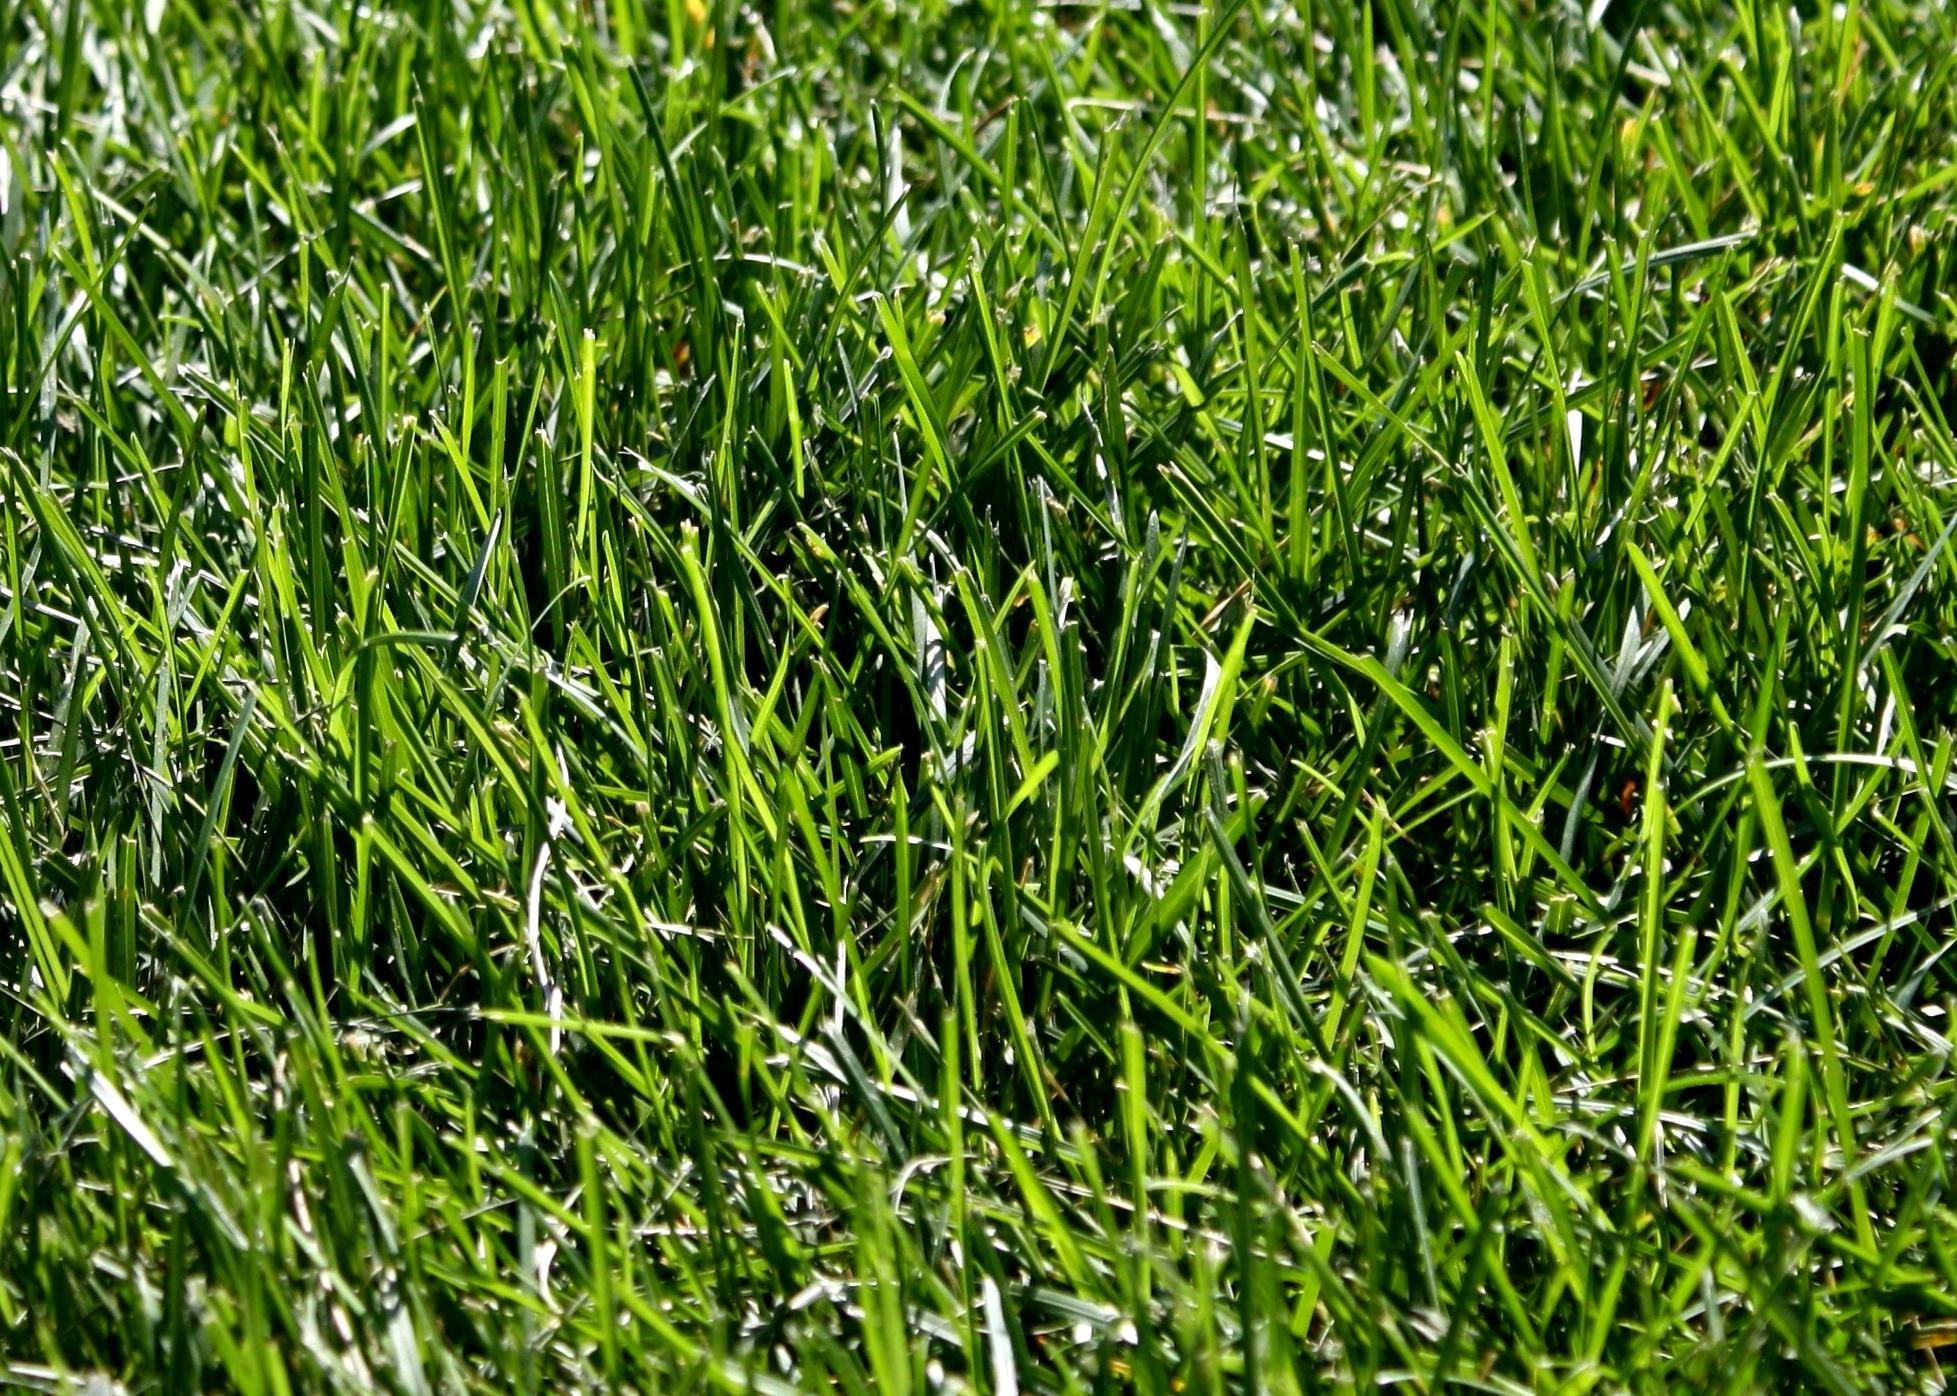 Grass texture free images, public domain images